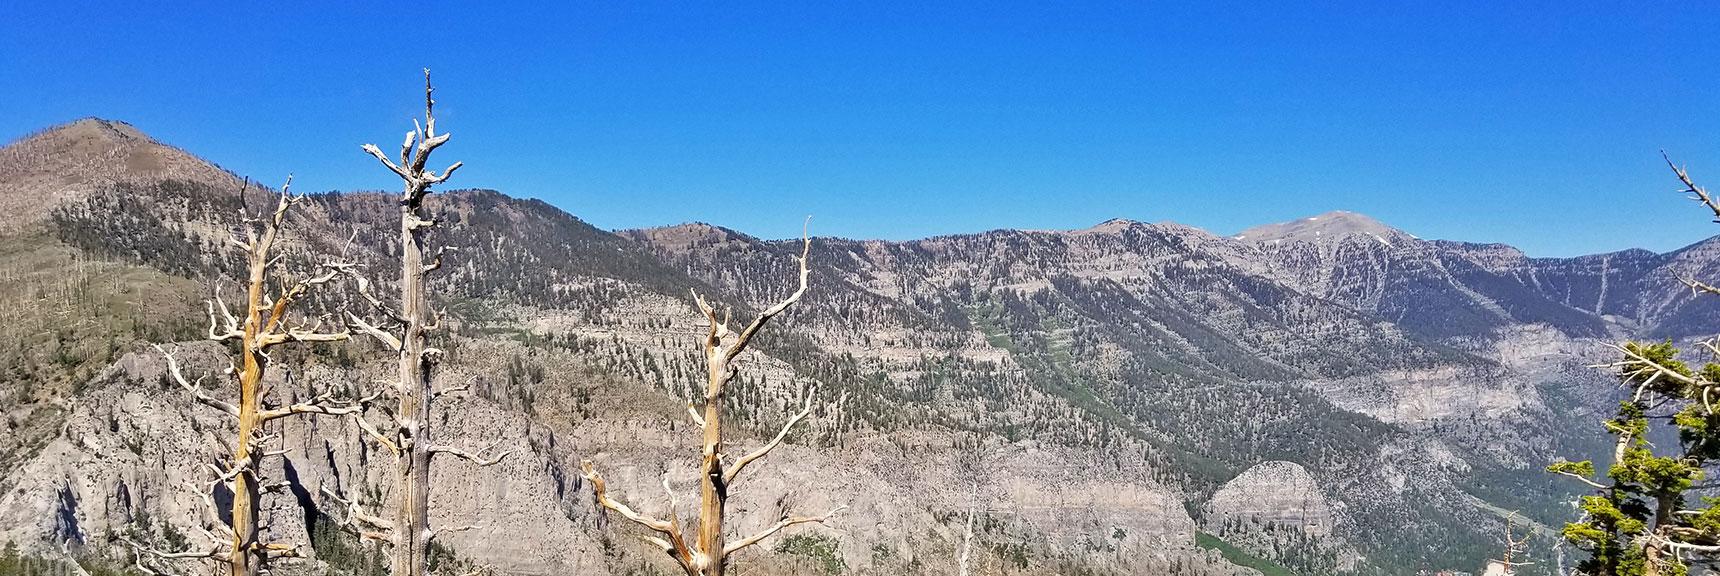 Griffith Peak, Kyle Canyon South Ridge and Charleston Peak from Harris Mountain Summit | Harris Mountain Griffith Peak Circuit in Mt. Charleston Wilderness, Nevada